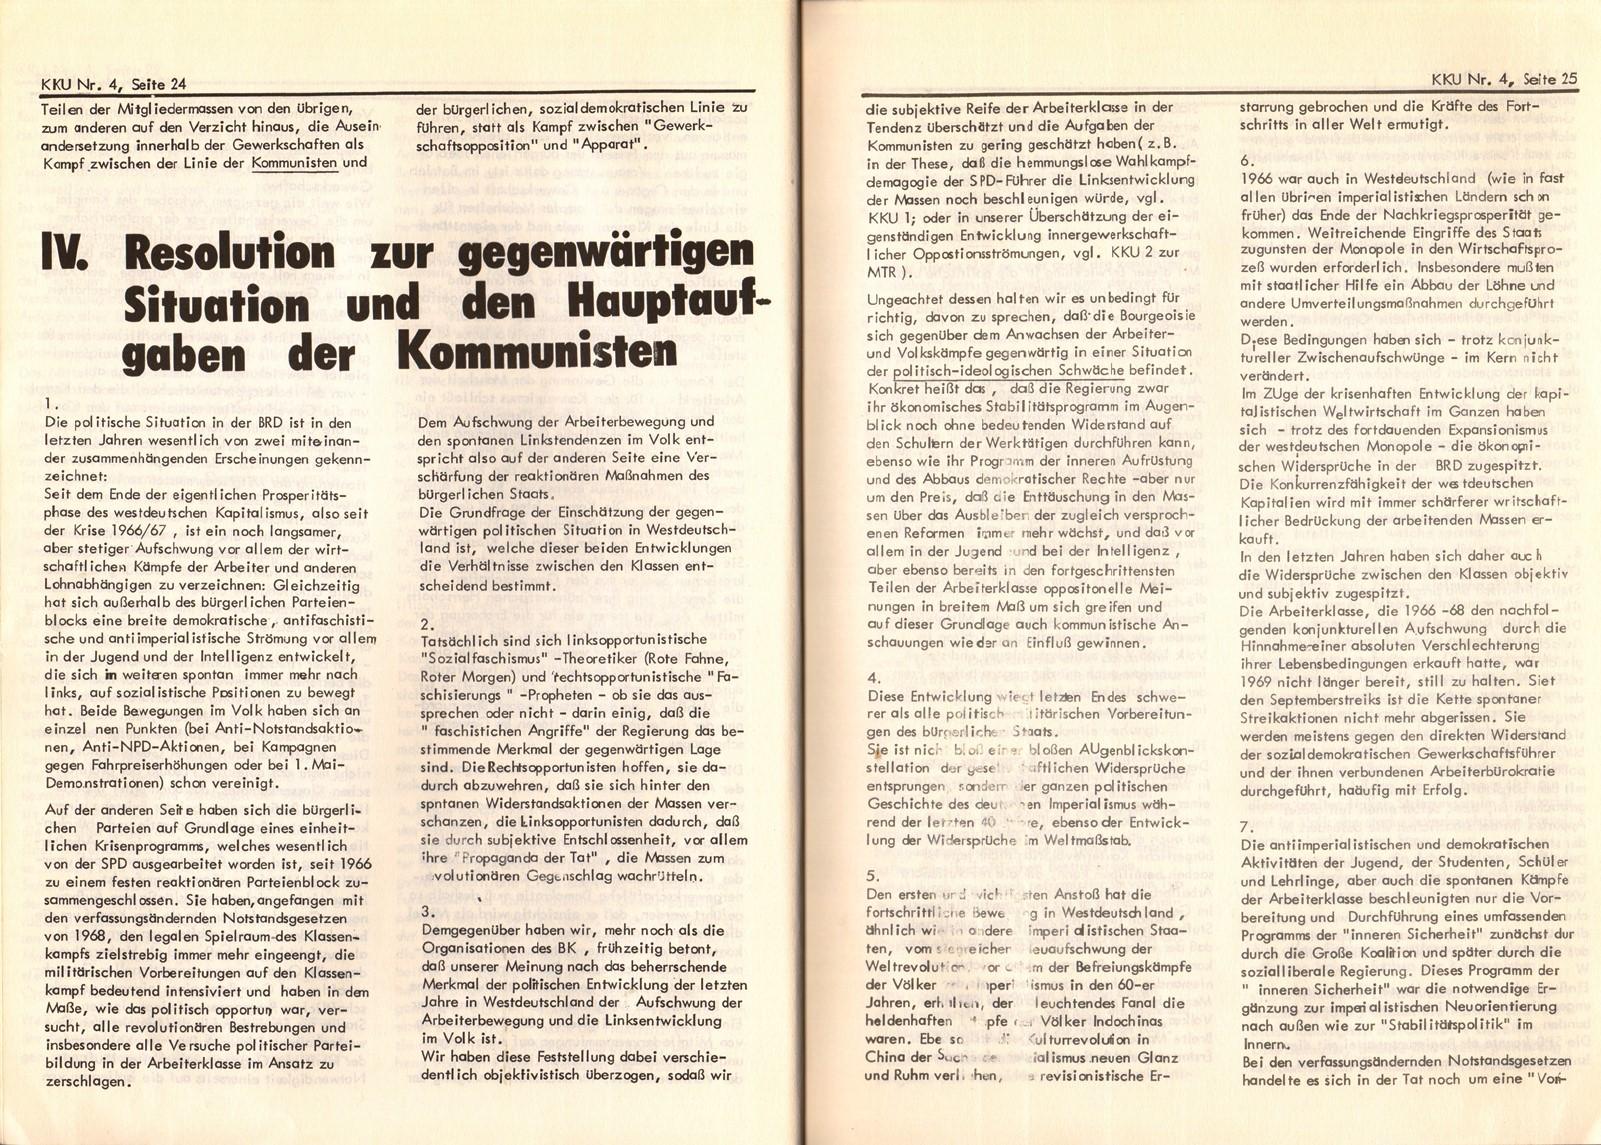 Frankfurt_Offenbach_KG_Kampf_Kritik_Umgestaltung_1973_04_05_13